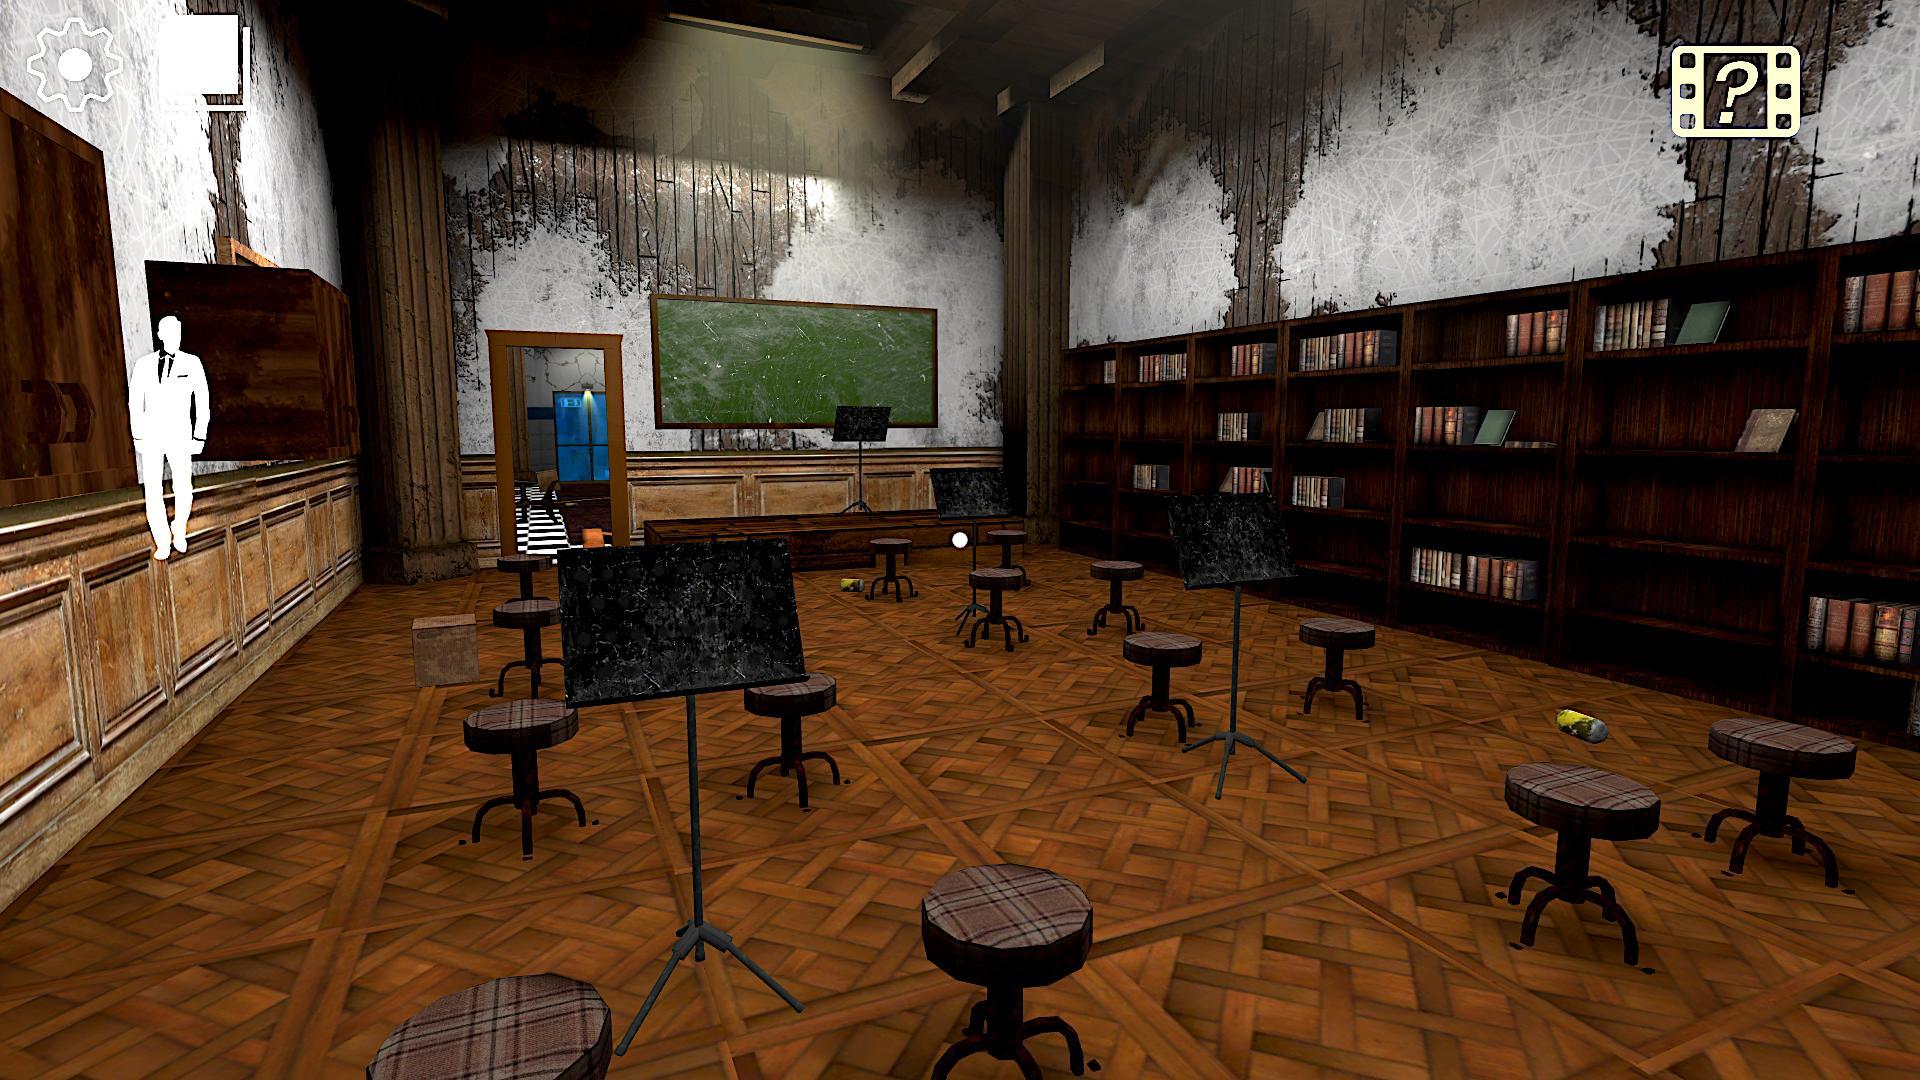 Evil Erich Sann : The New Horror Games. 2.5.0 Screenshot 6